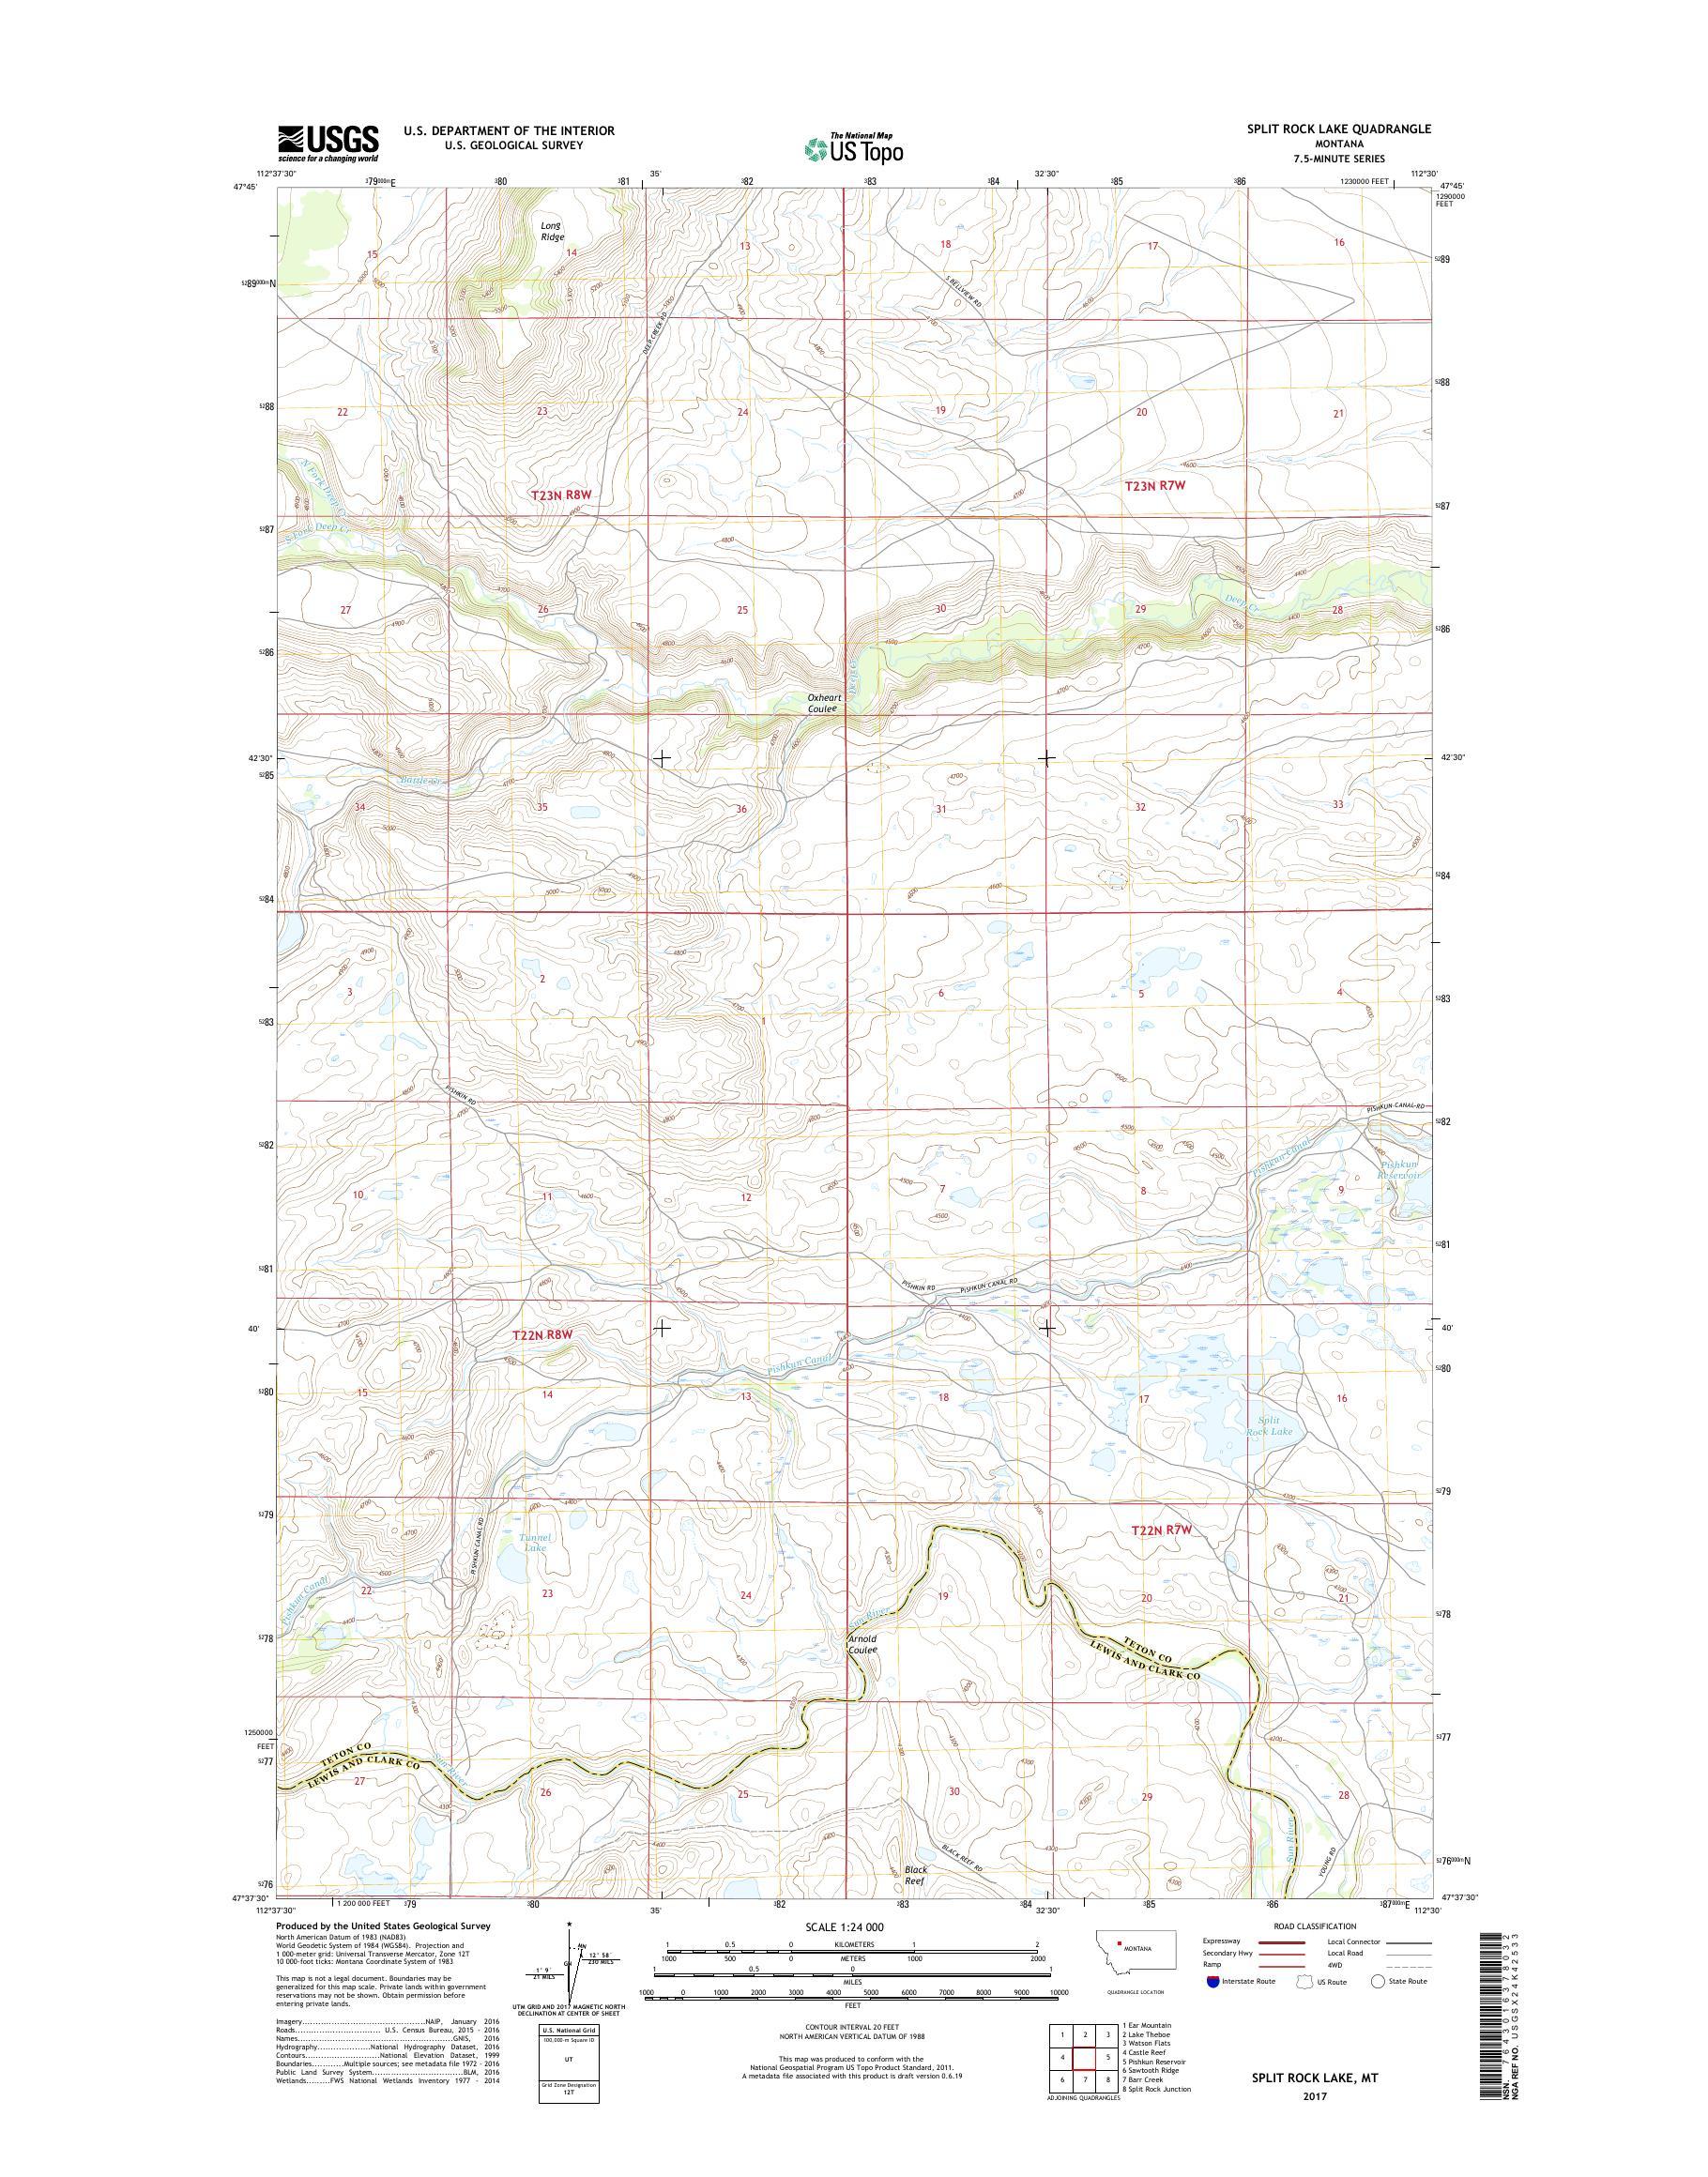 MyTopo Split Rock Lake, Montana USGS Quad Topo Map on